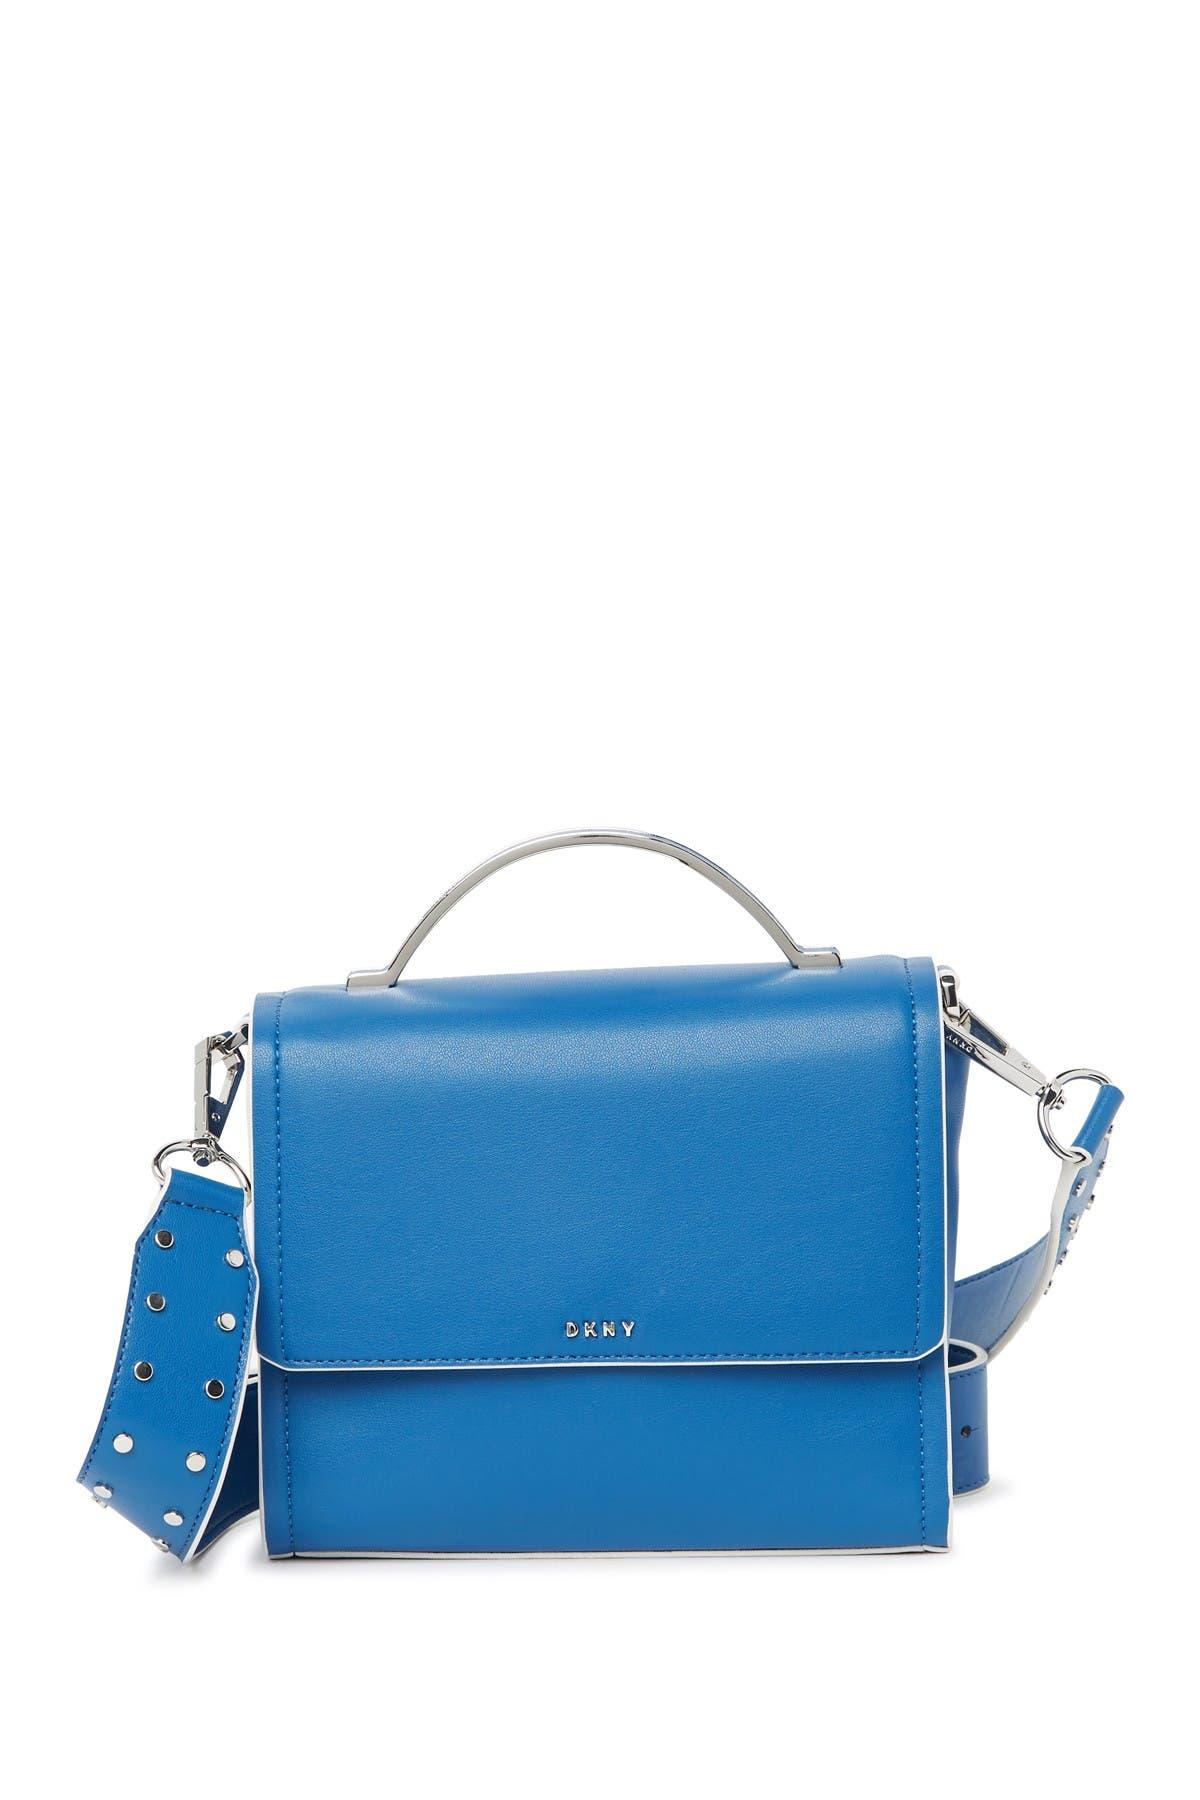 Image of DKNY Lane Studded Leather Crossbody Bag